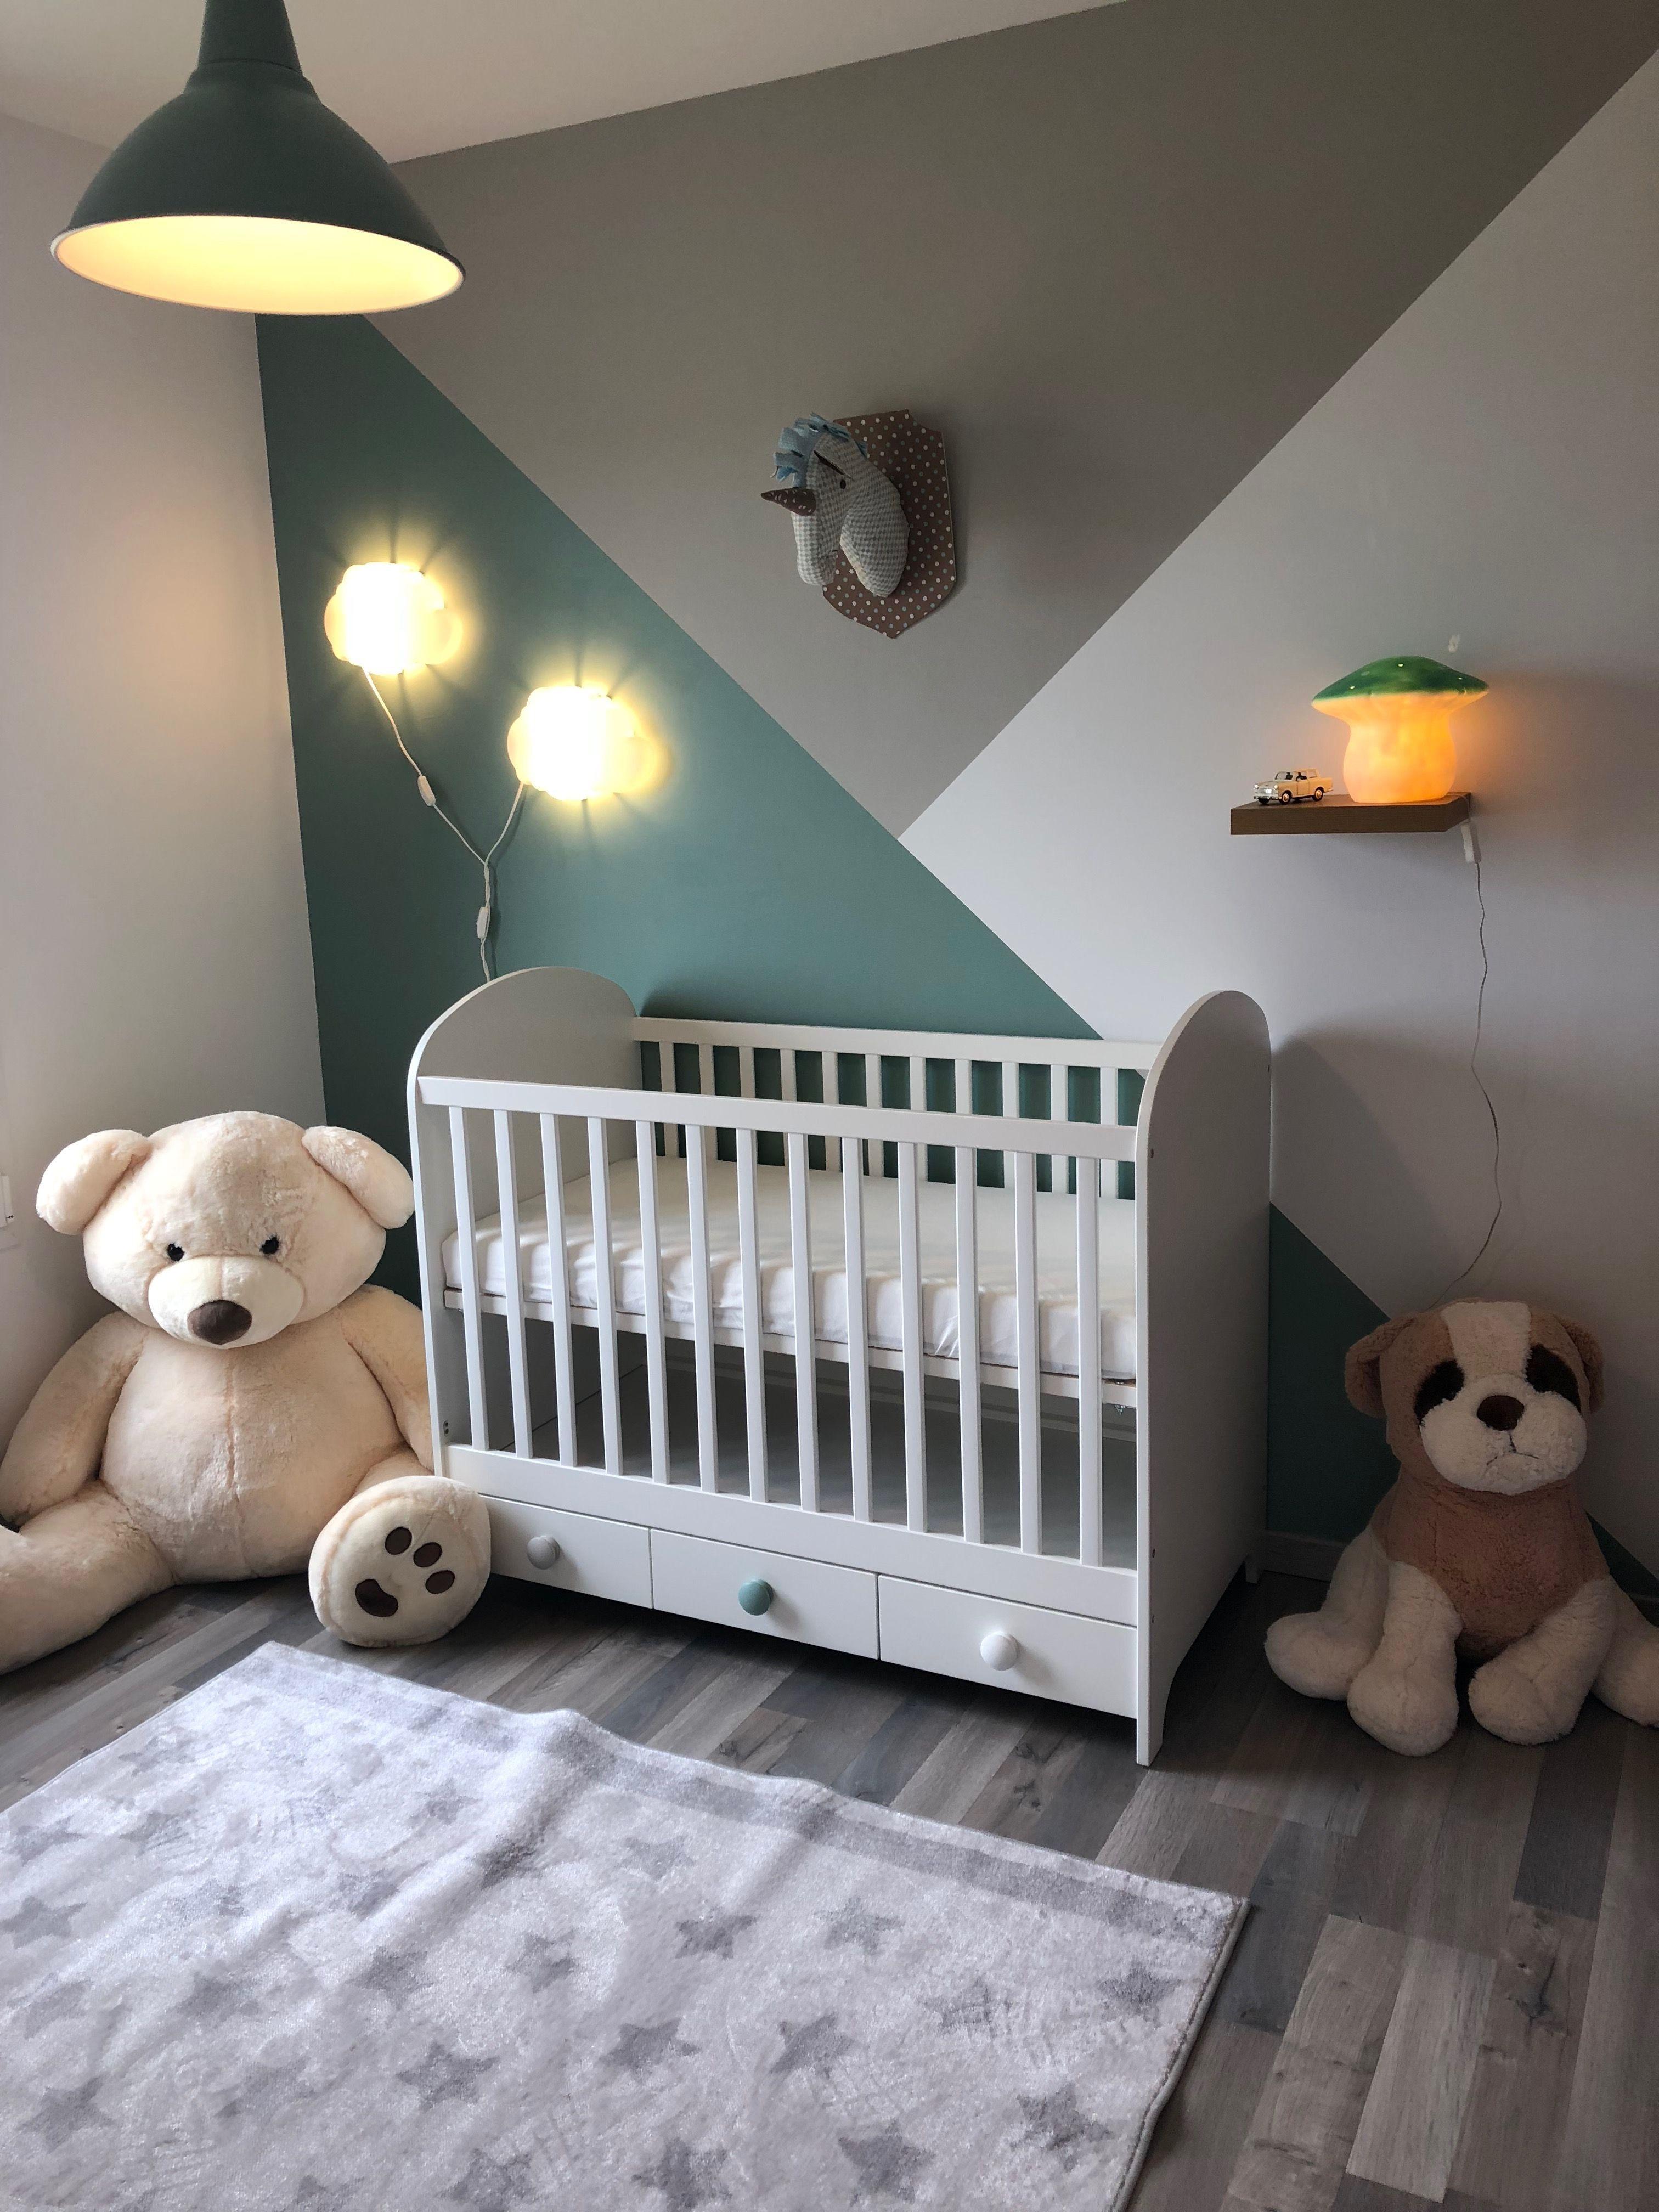 Wall For Kids Rooms Peinture Chambre Bebe Deco Chambre Bebe